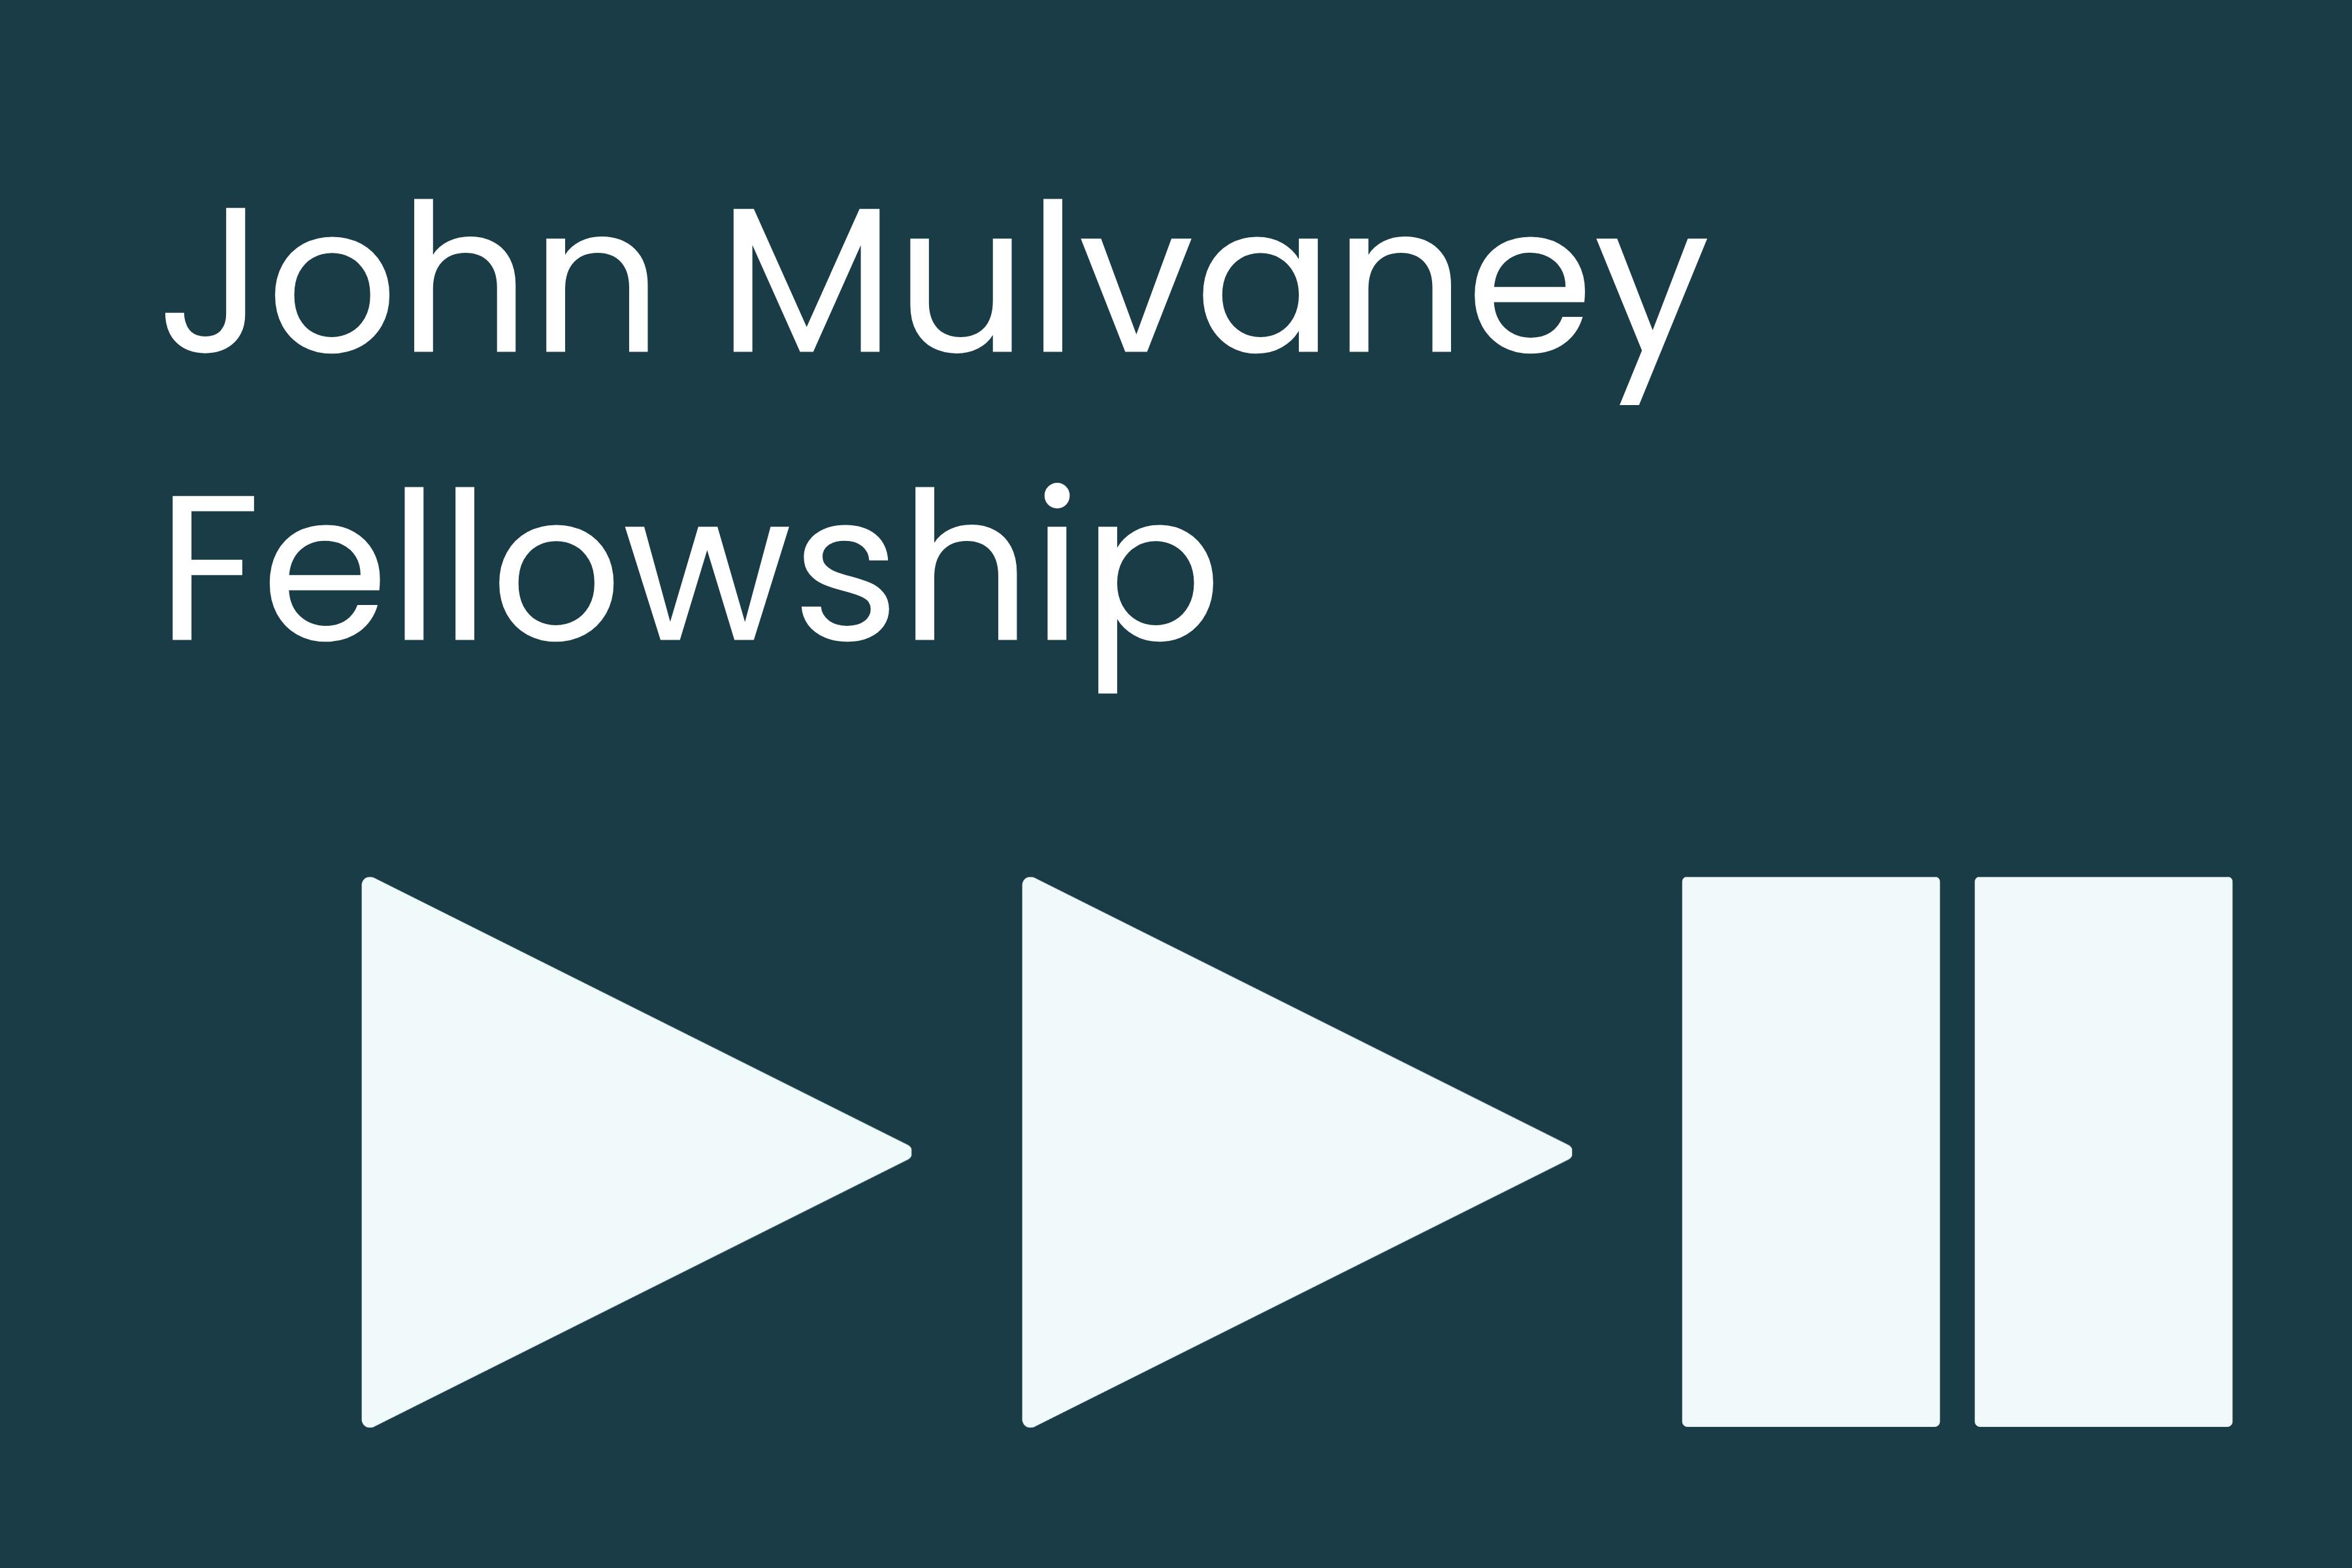 John Mulvaney Fellowship